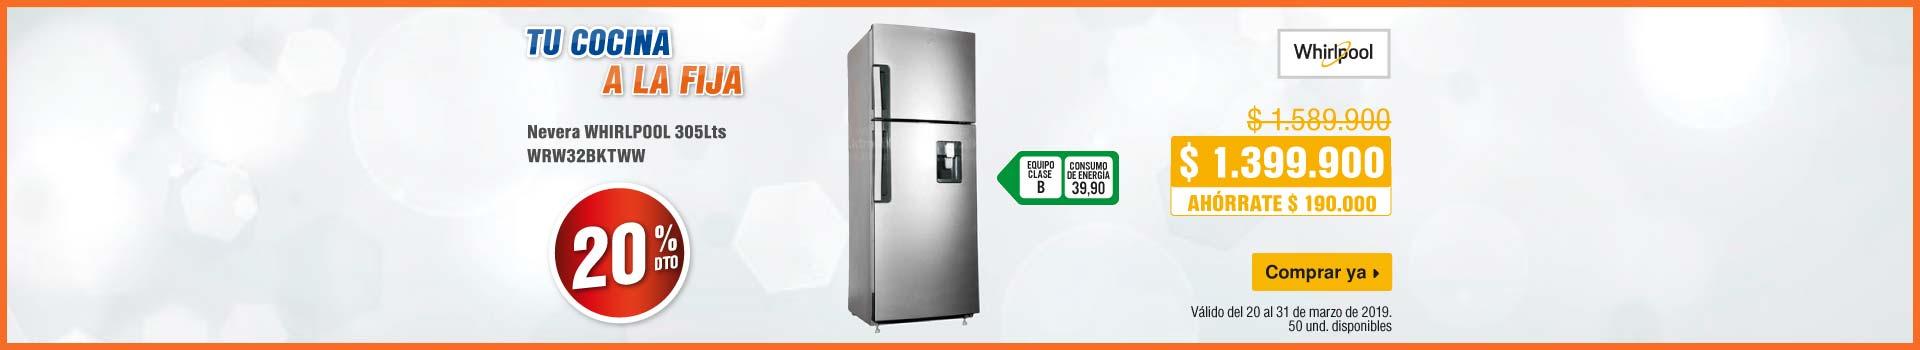 AK-KT-mayores-1-ELECT-BCAT-refrigeracion-WHIRLPOOL-200319